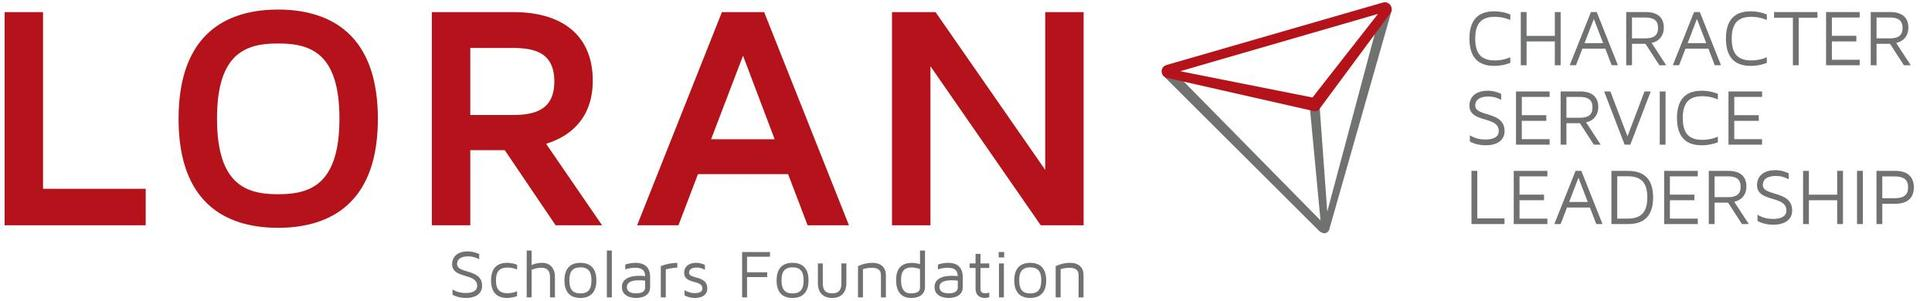 Loran Scholarship Banner